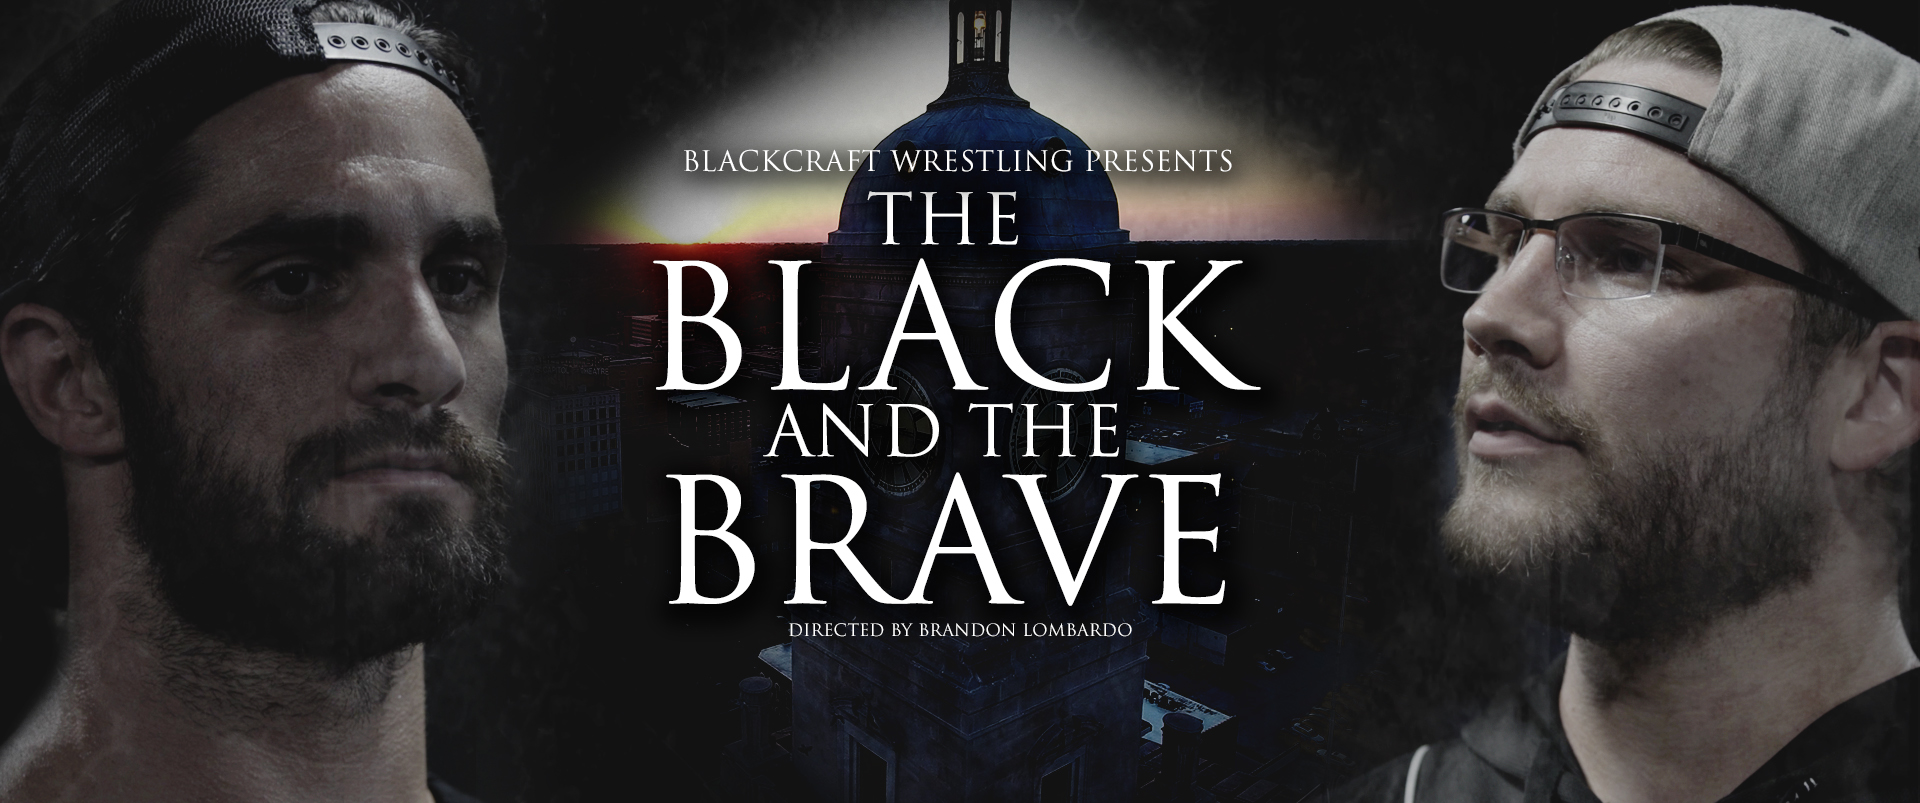 Brave – Blackcraft And Wrestling The Black